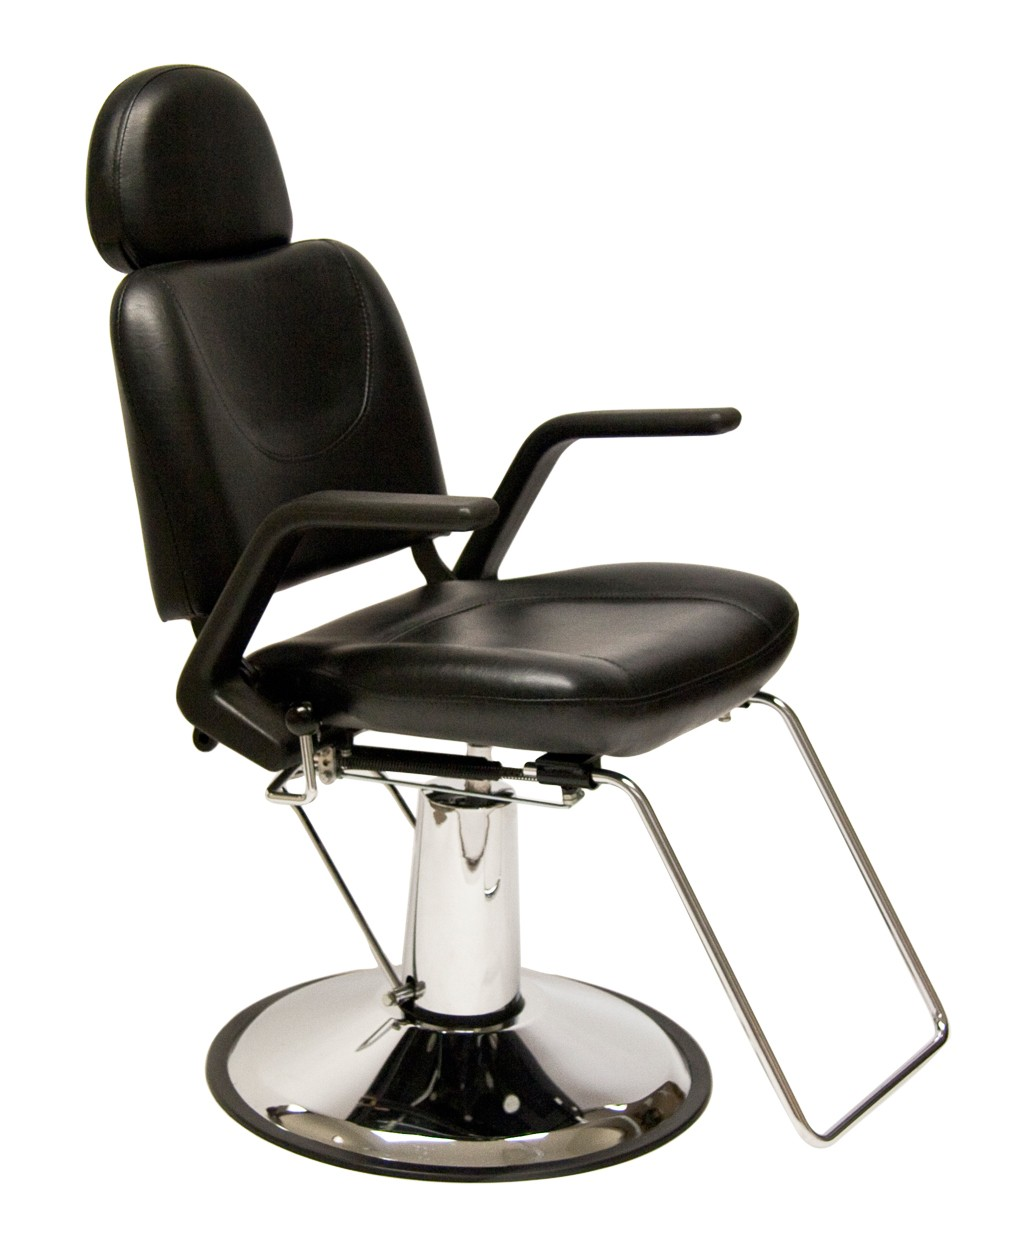 Sue All Purpose Hydraulic Salon Chair with Headrest